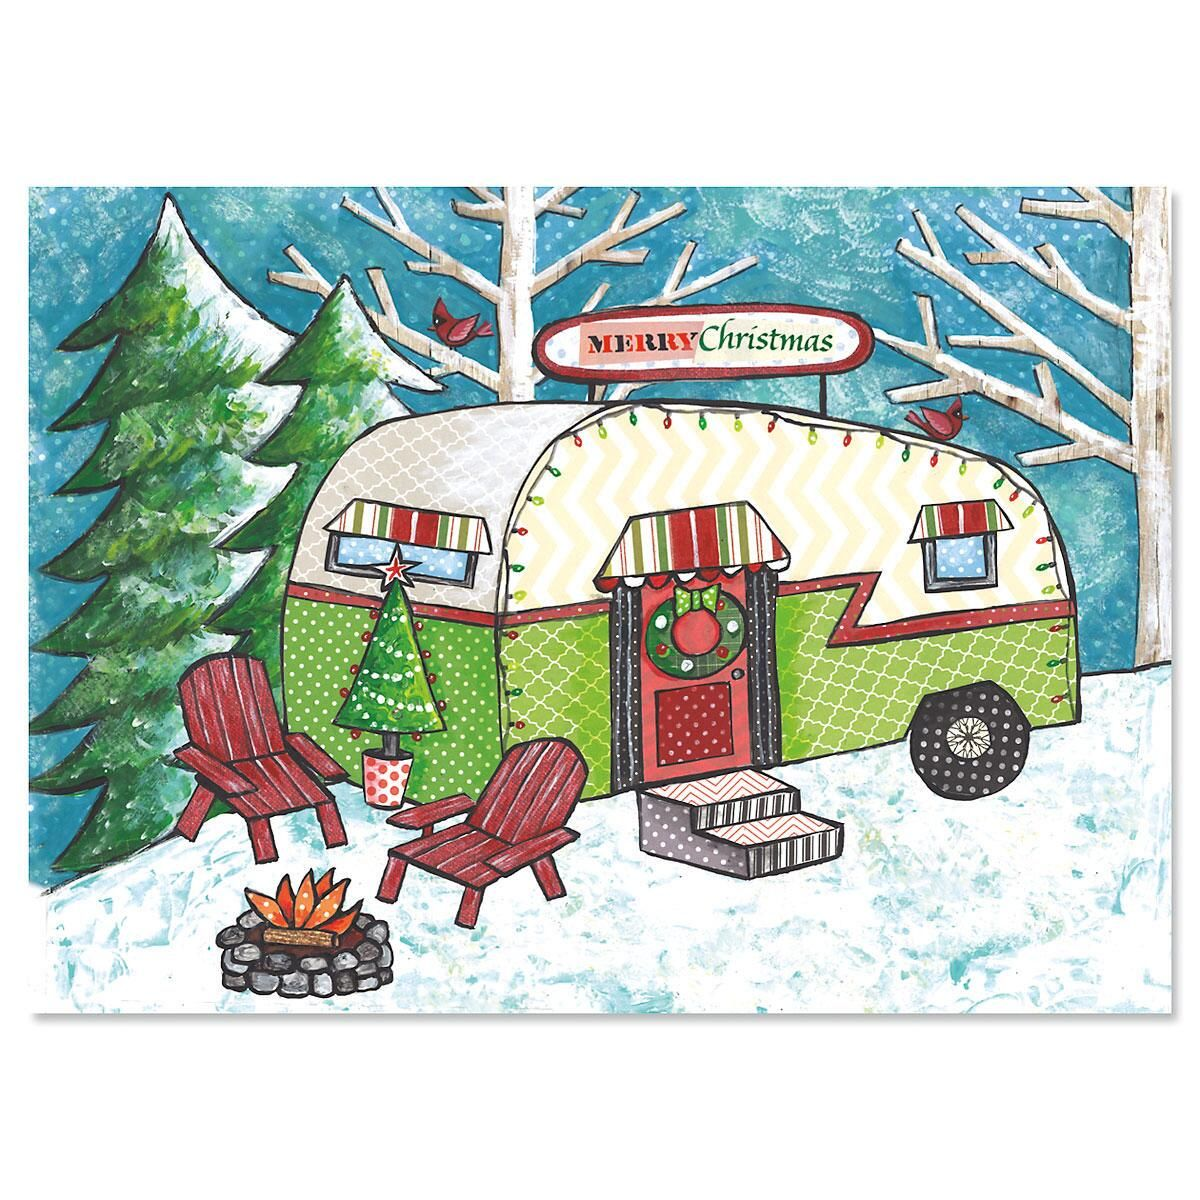 Homeward Bound Nonpersonalized Christmas Cards - Set of 18